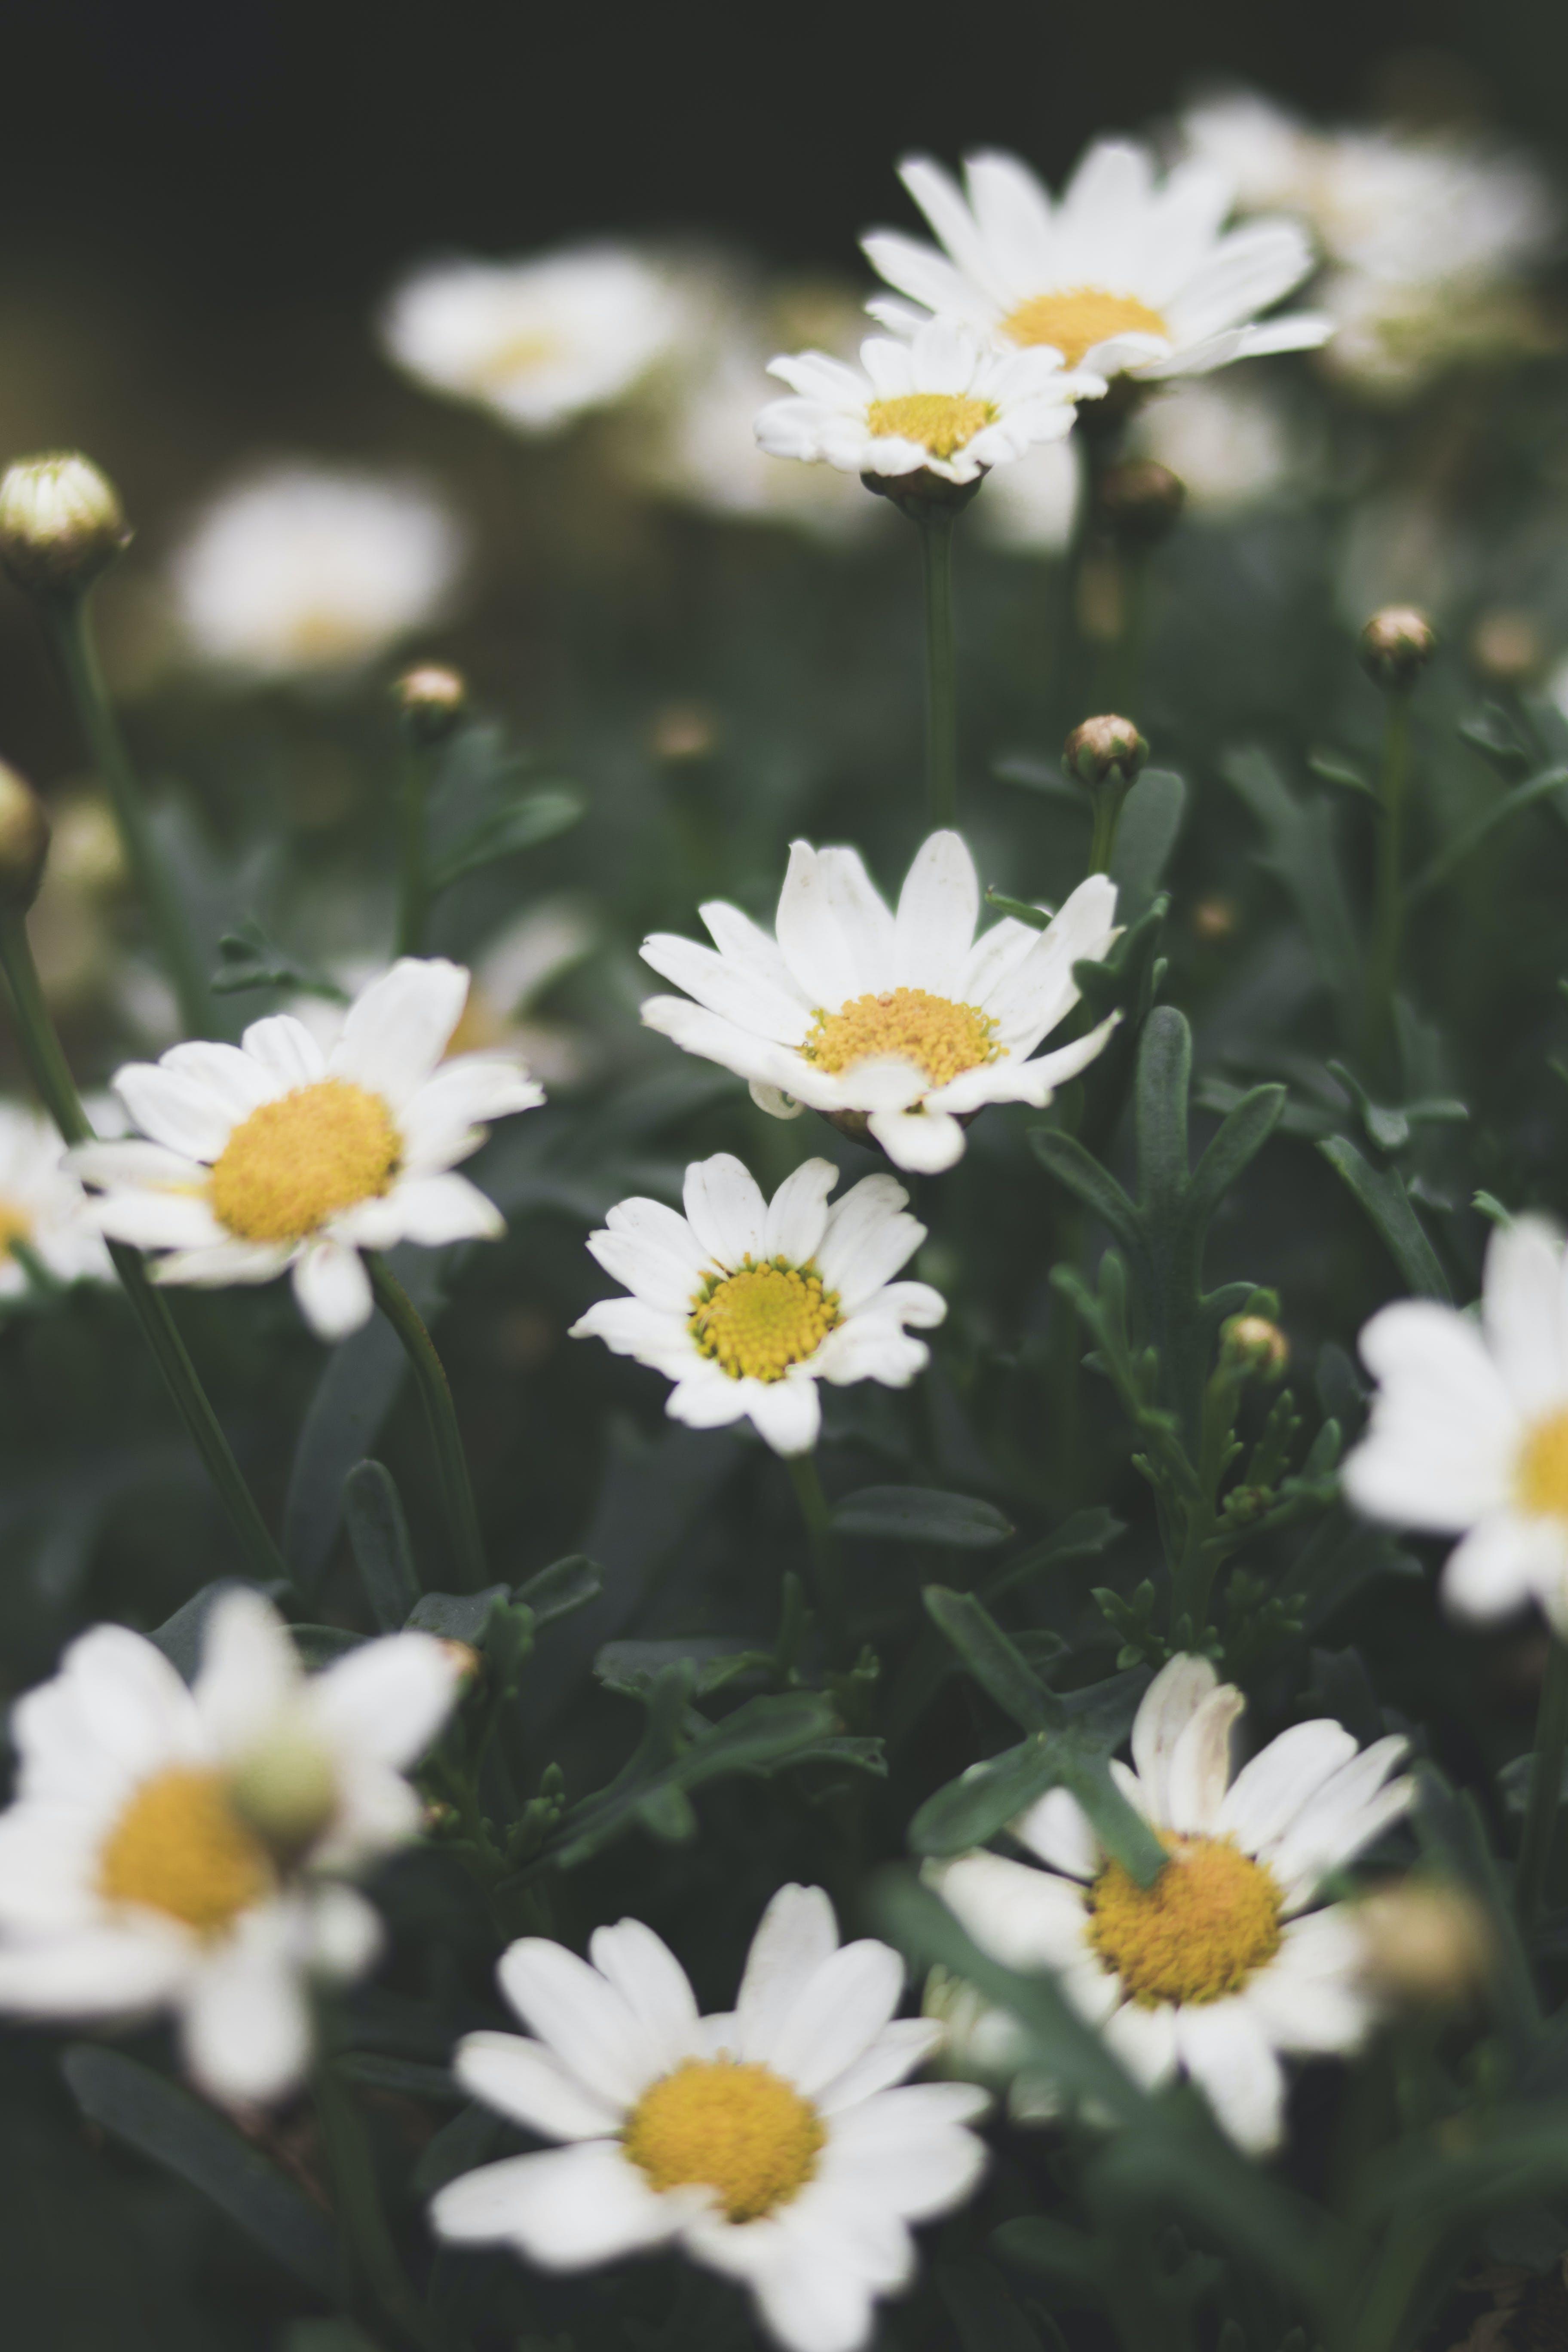 Shallow Focus Photograph of Daisy Flower